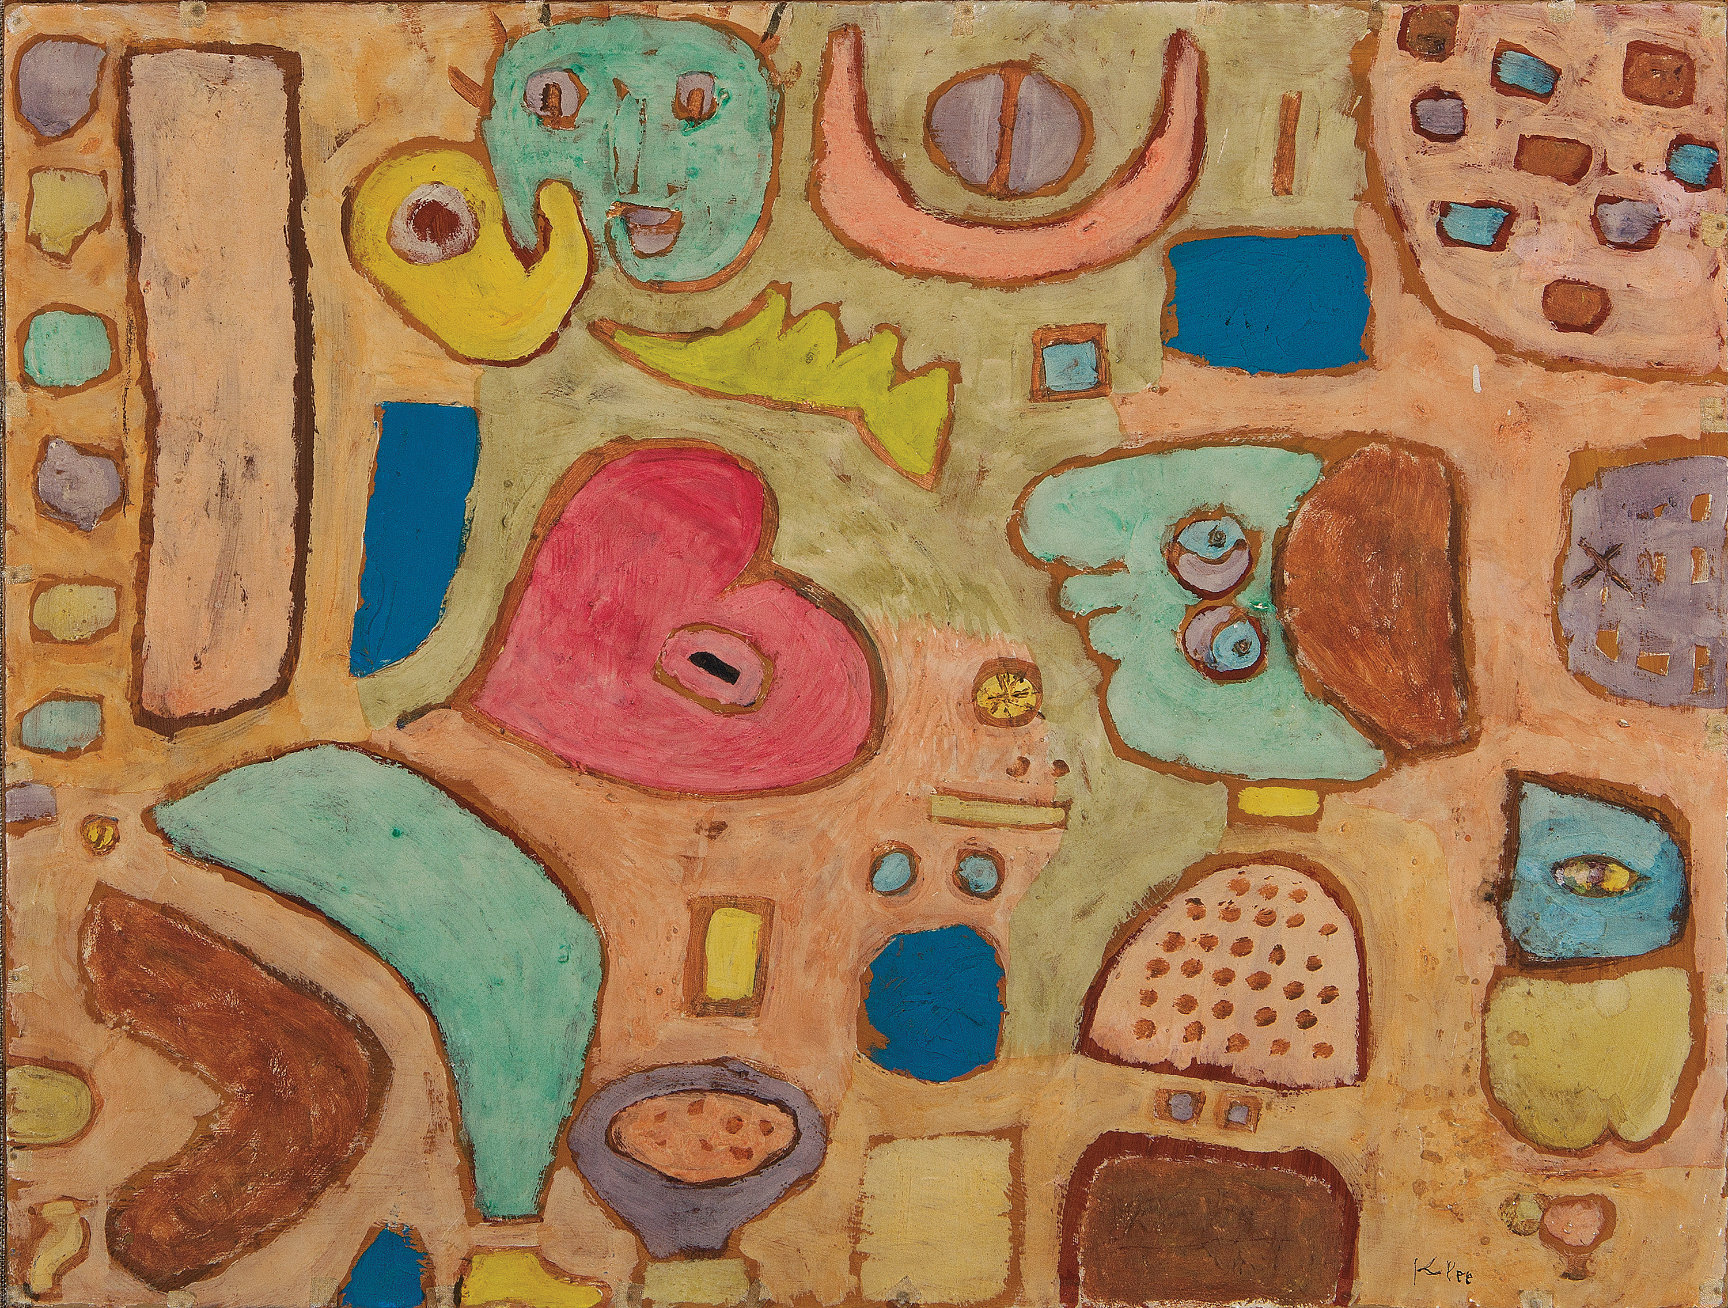 Abb. 1 Paul Klee, das kranke Herz , 1939, 382, Kleisterfarbe auf Karton, 40,7 x 54 cm , Moeller Fine Art, New York © Moeller Fine Art, New York